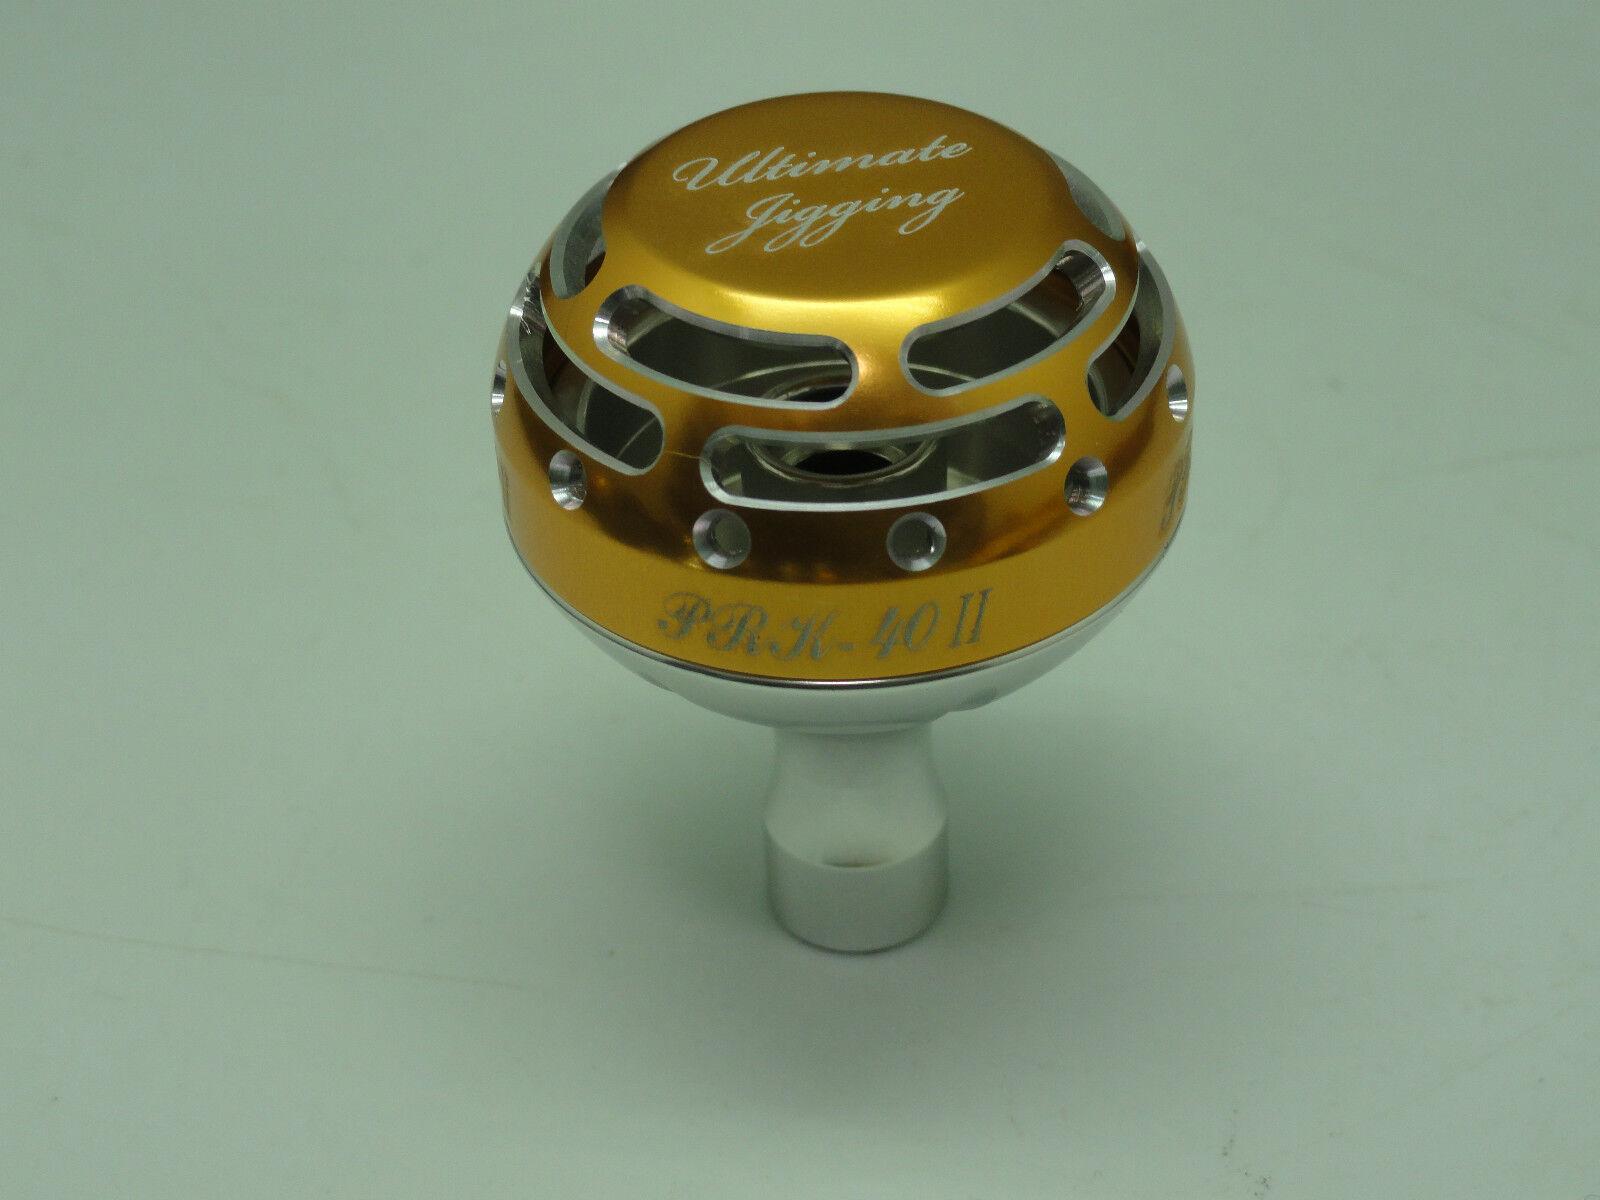 U.J. PRK 40 type II Knob for SHIMANO Stella SW 5000 - 20000 Twinpower reel GD SV